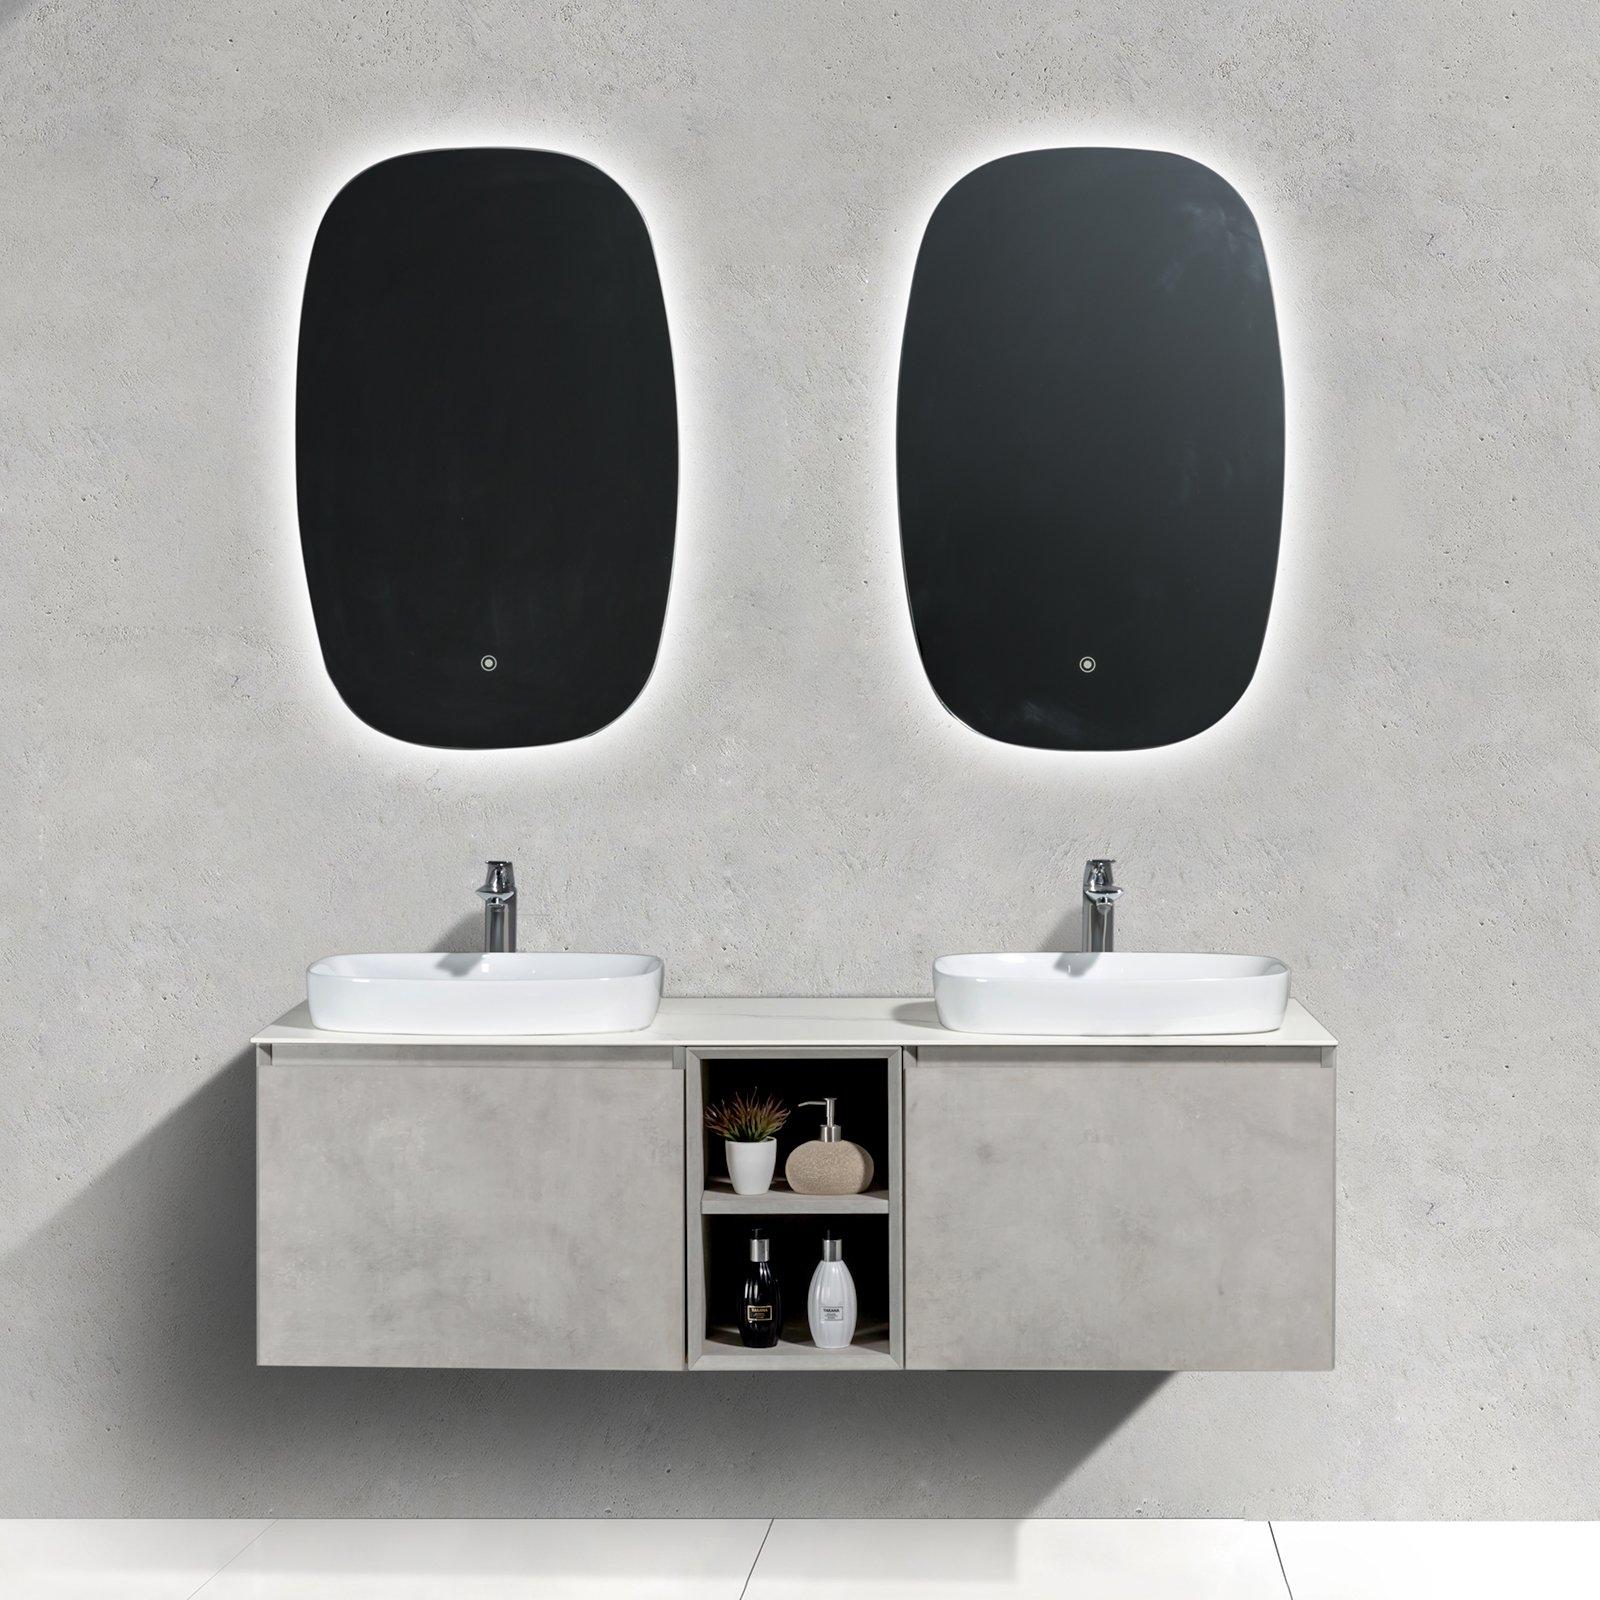 Badmöbel-Set INALCO 1500 Beton-Optik - Spiegel optional